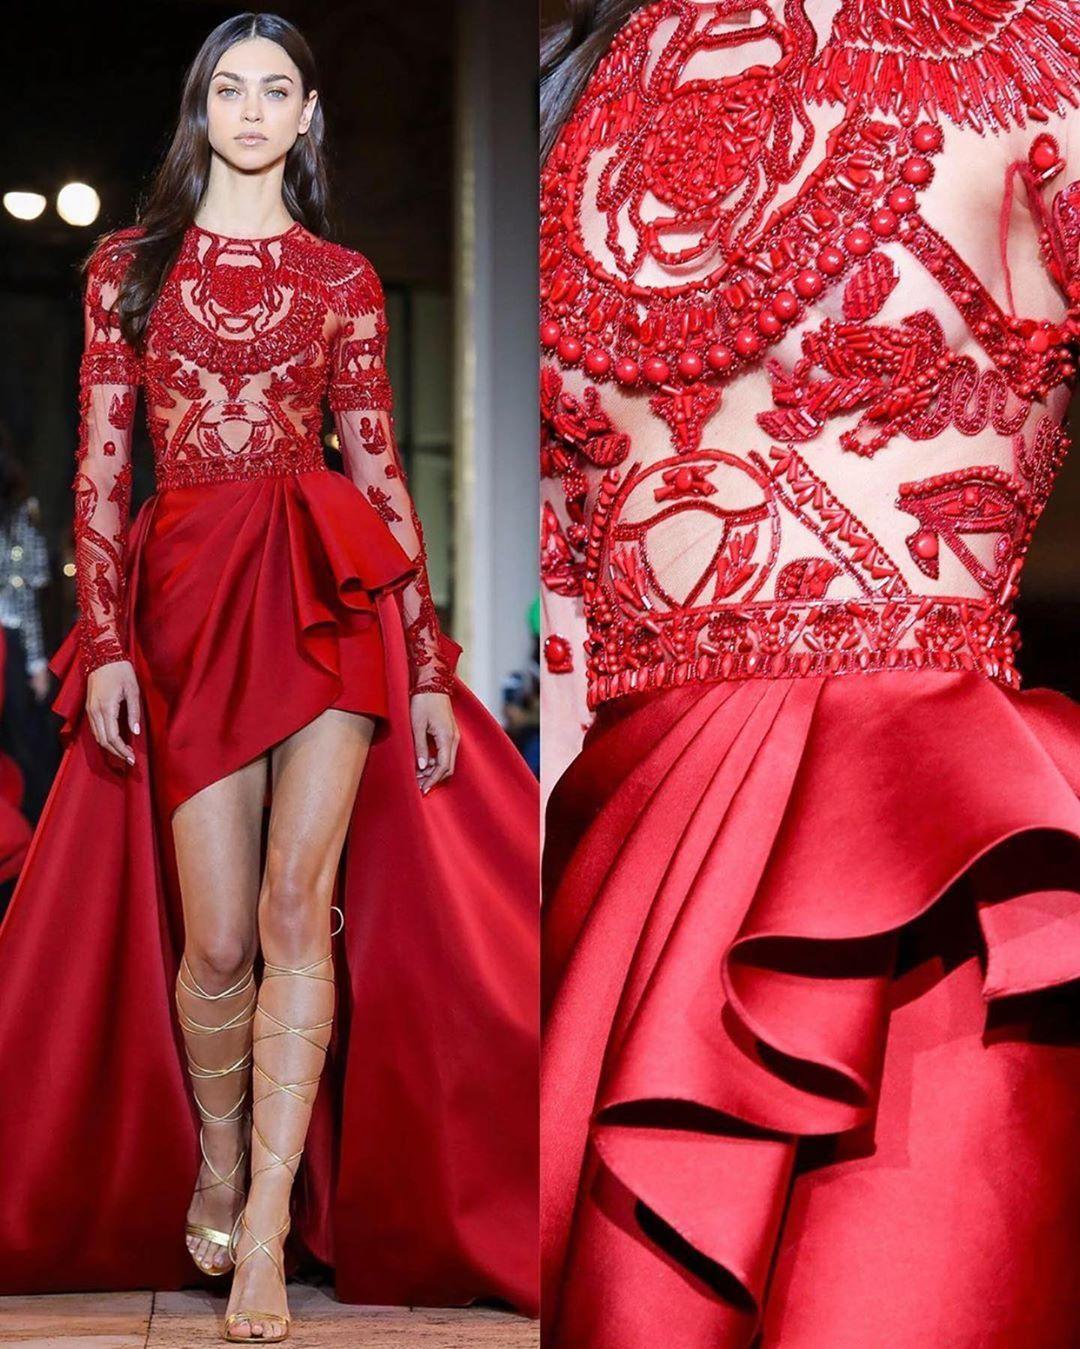 3 408 Curtidas 25 Comentarios Moh D Subhi Dabbagh Ghazal Textile No Instagram Zuhairmurad Pfw 2020 مجموعة زهير مراد الجديدة في باريس الفساتين الحمرا